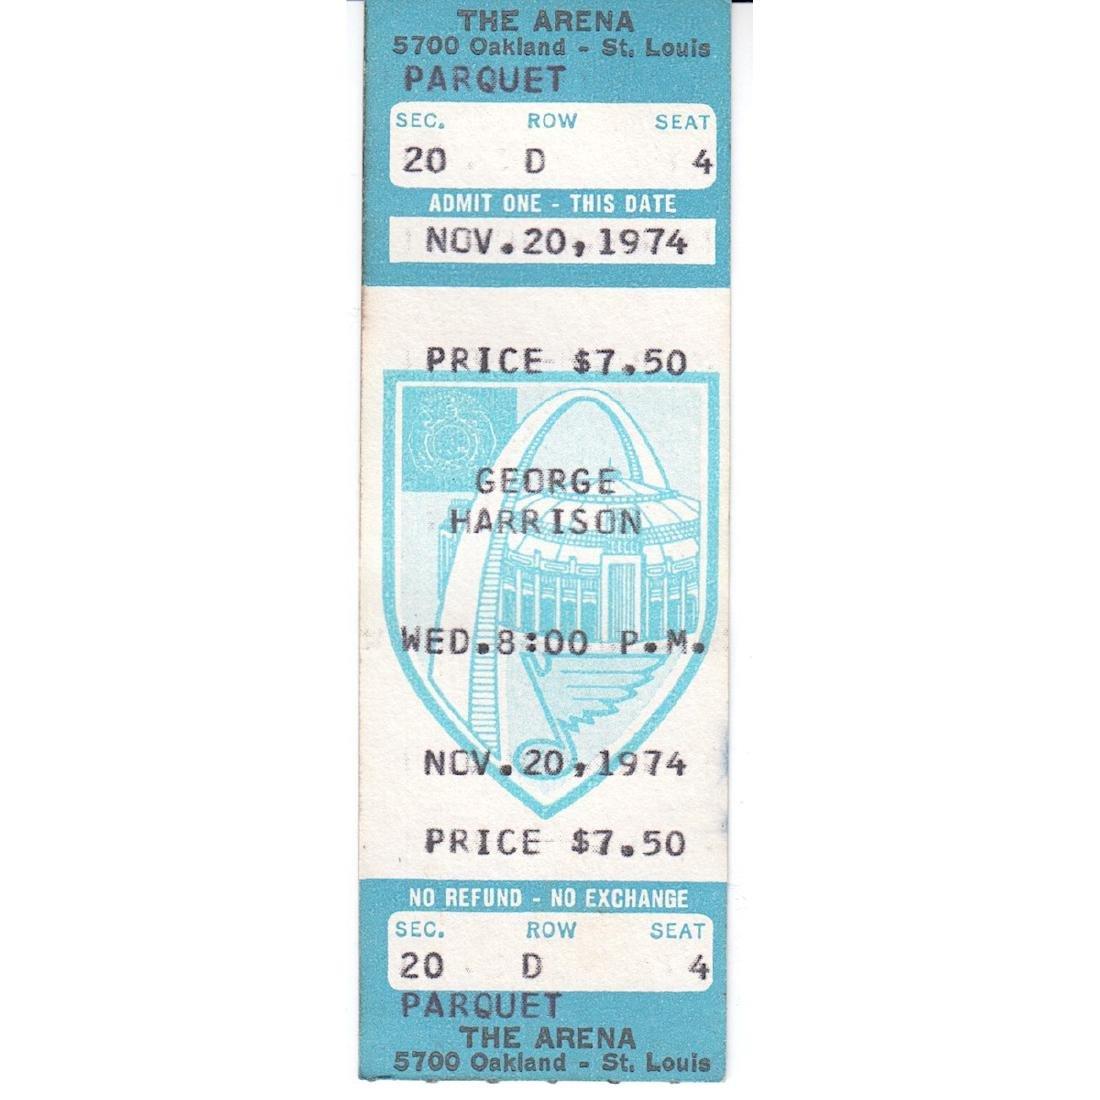 George Harrison - 1974 Vintage Concert Ticket